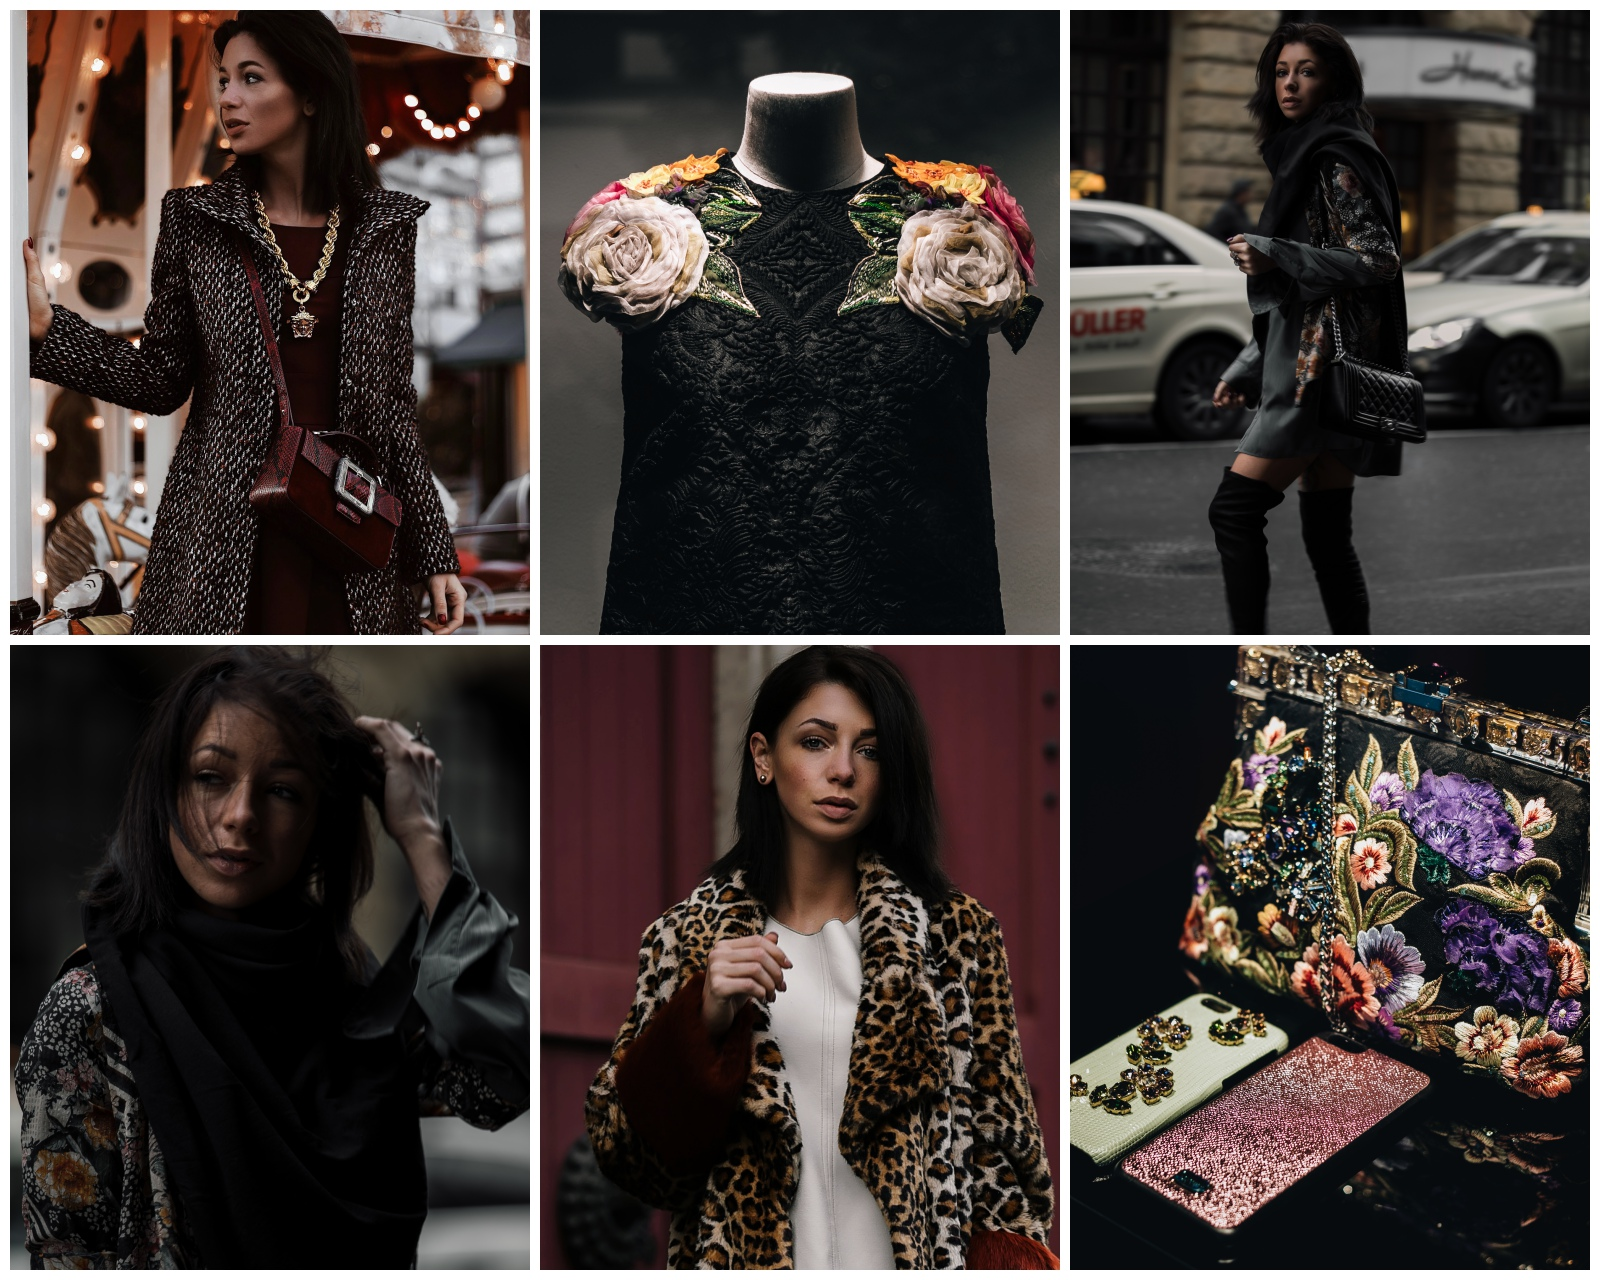 wochenrueckblick-kalenderwoche-47-couture-de-coeur-mode-blog-influencer-deutschland